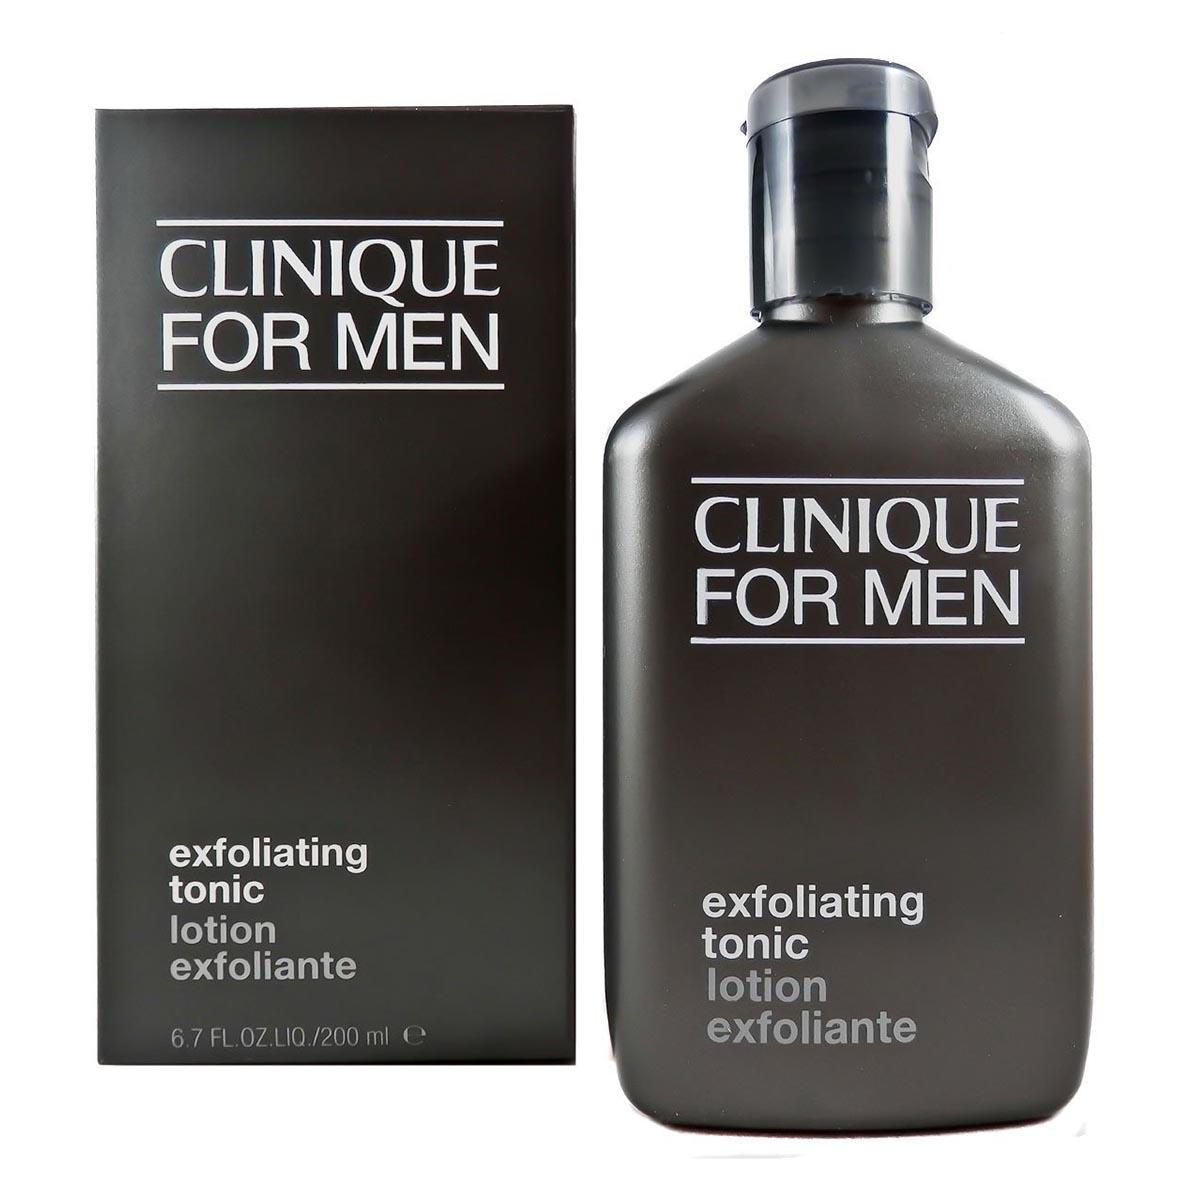 Clinique for men exfoliating lotion 200ml